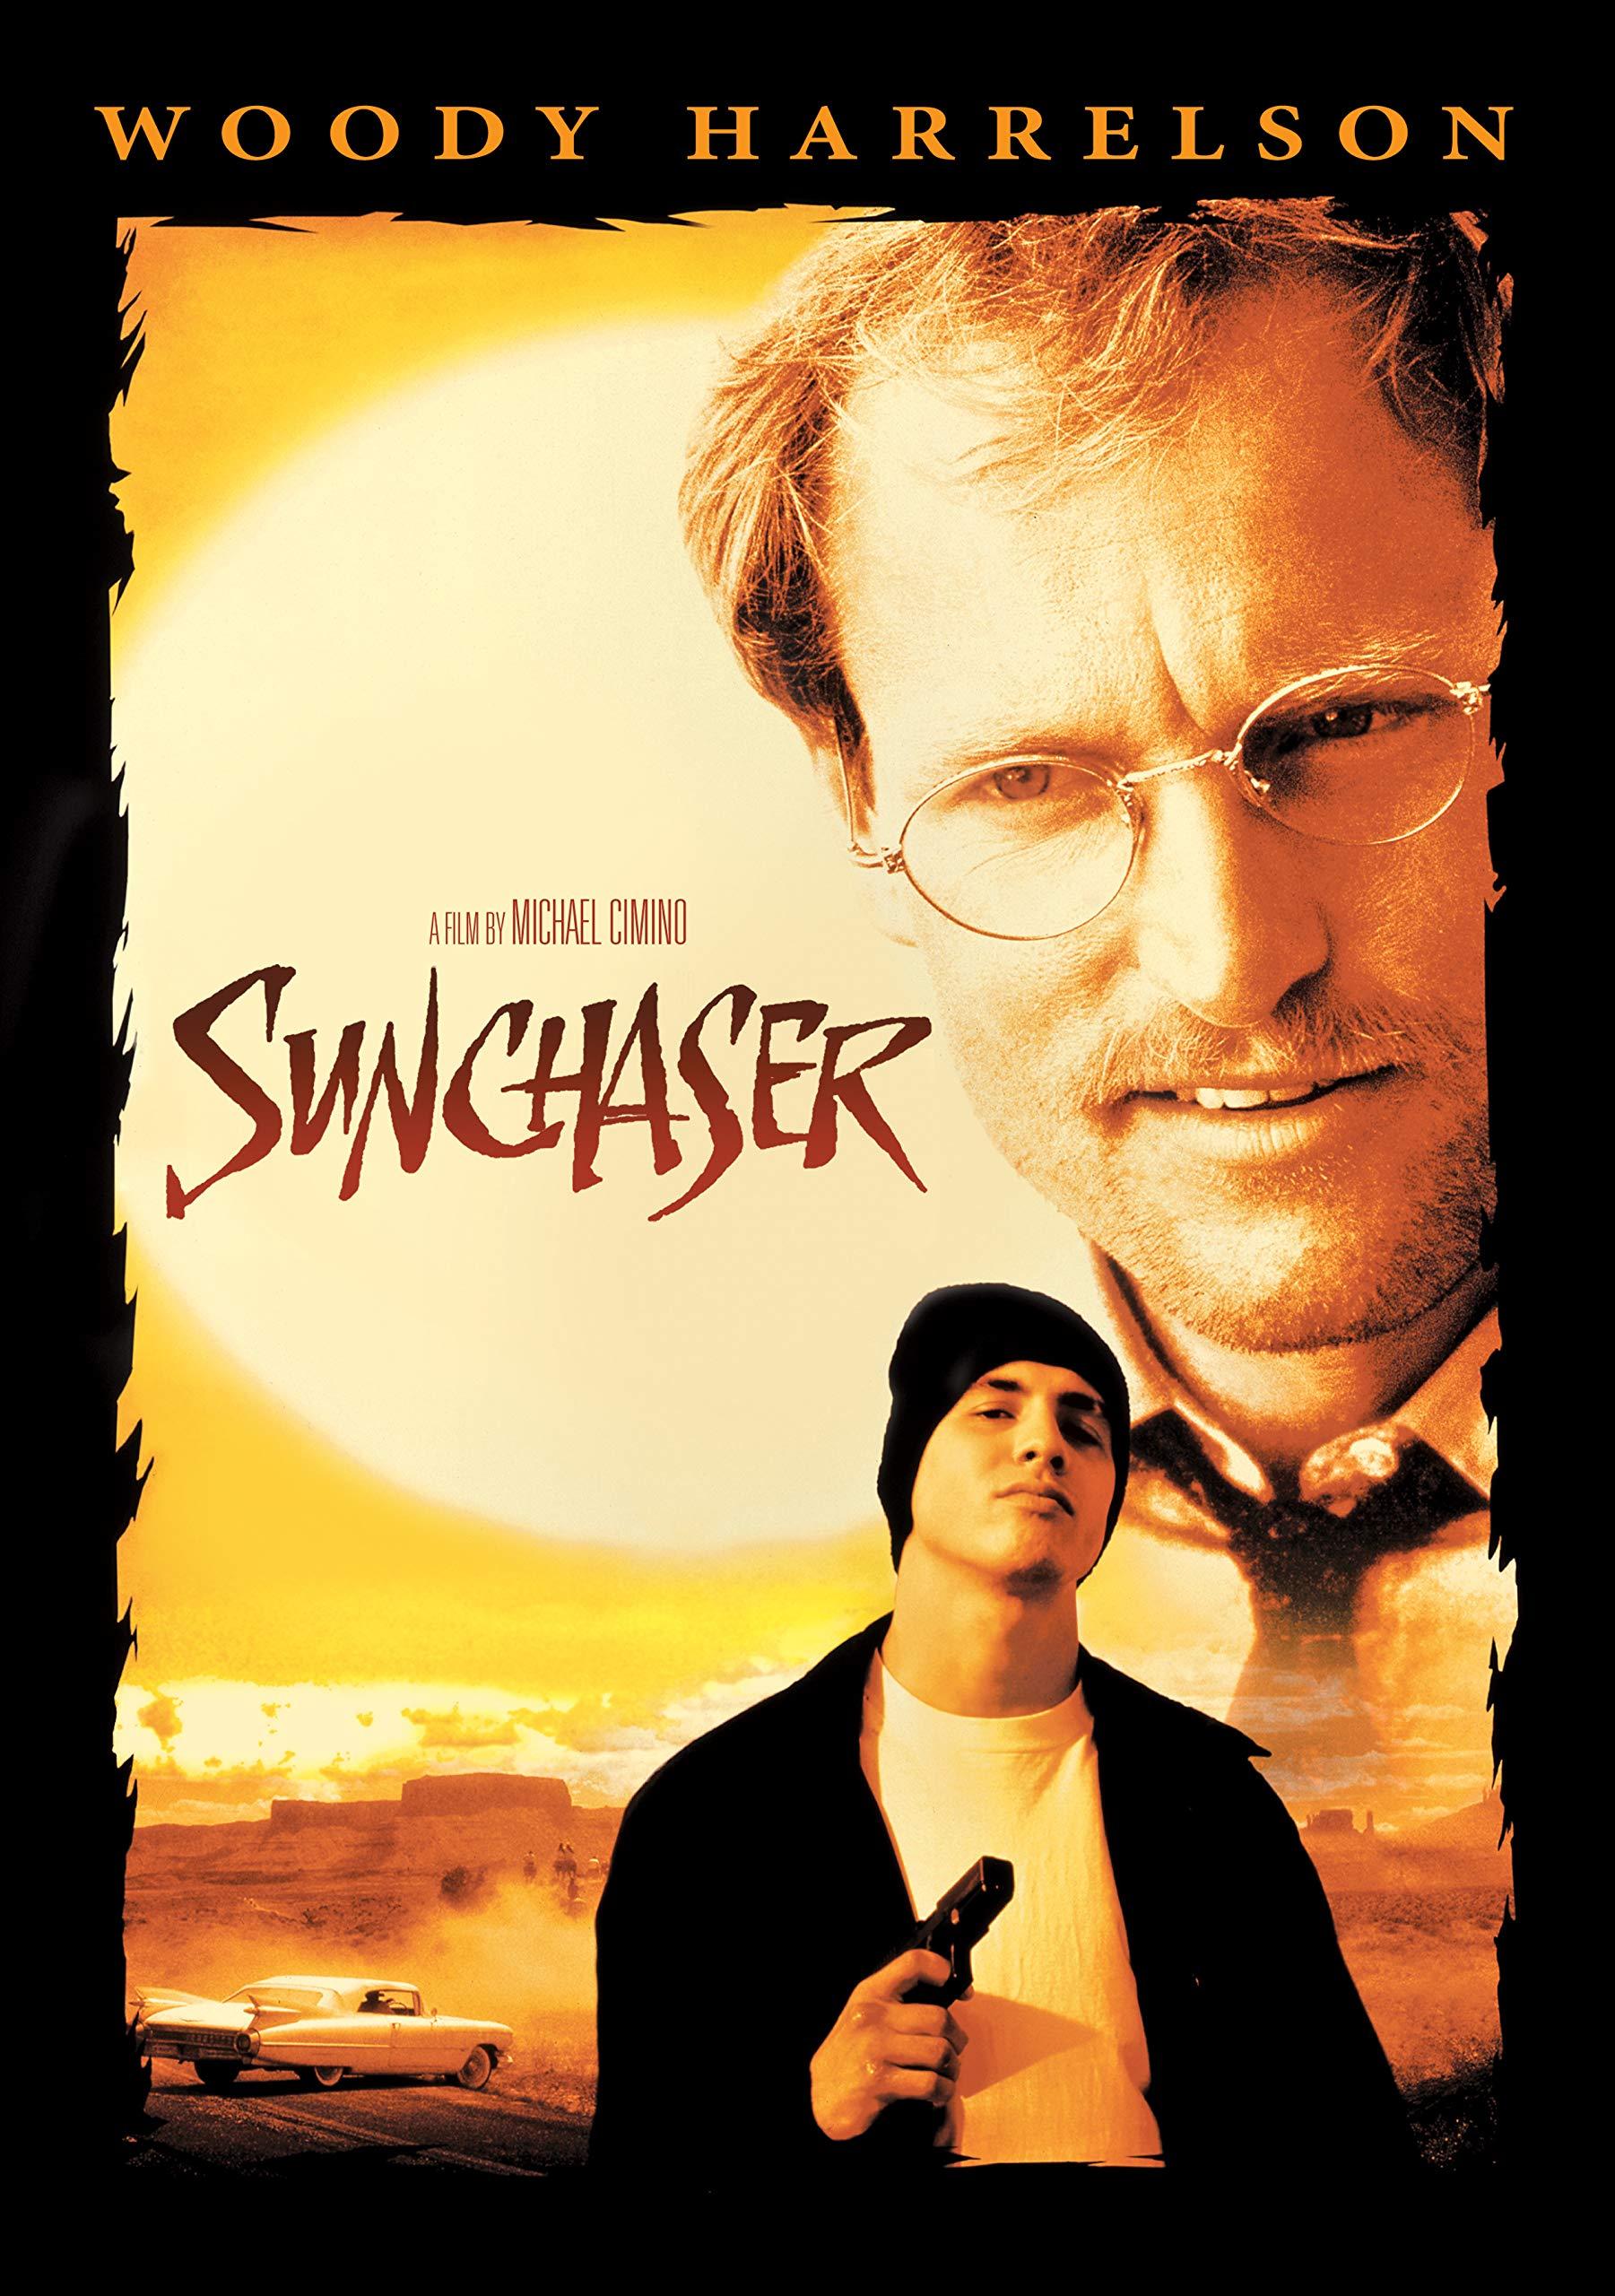 The Sunchaser